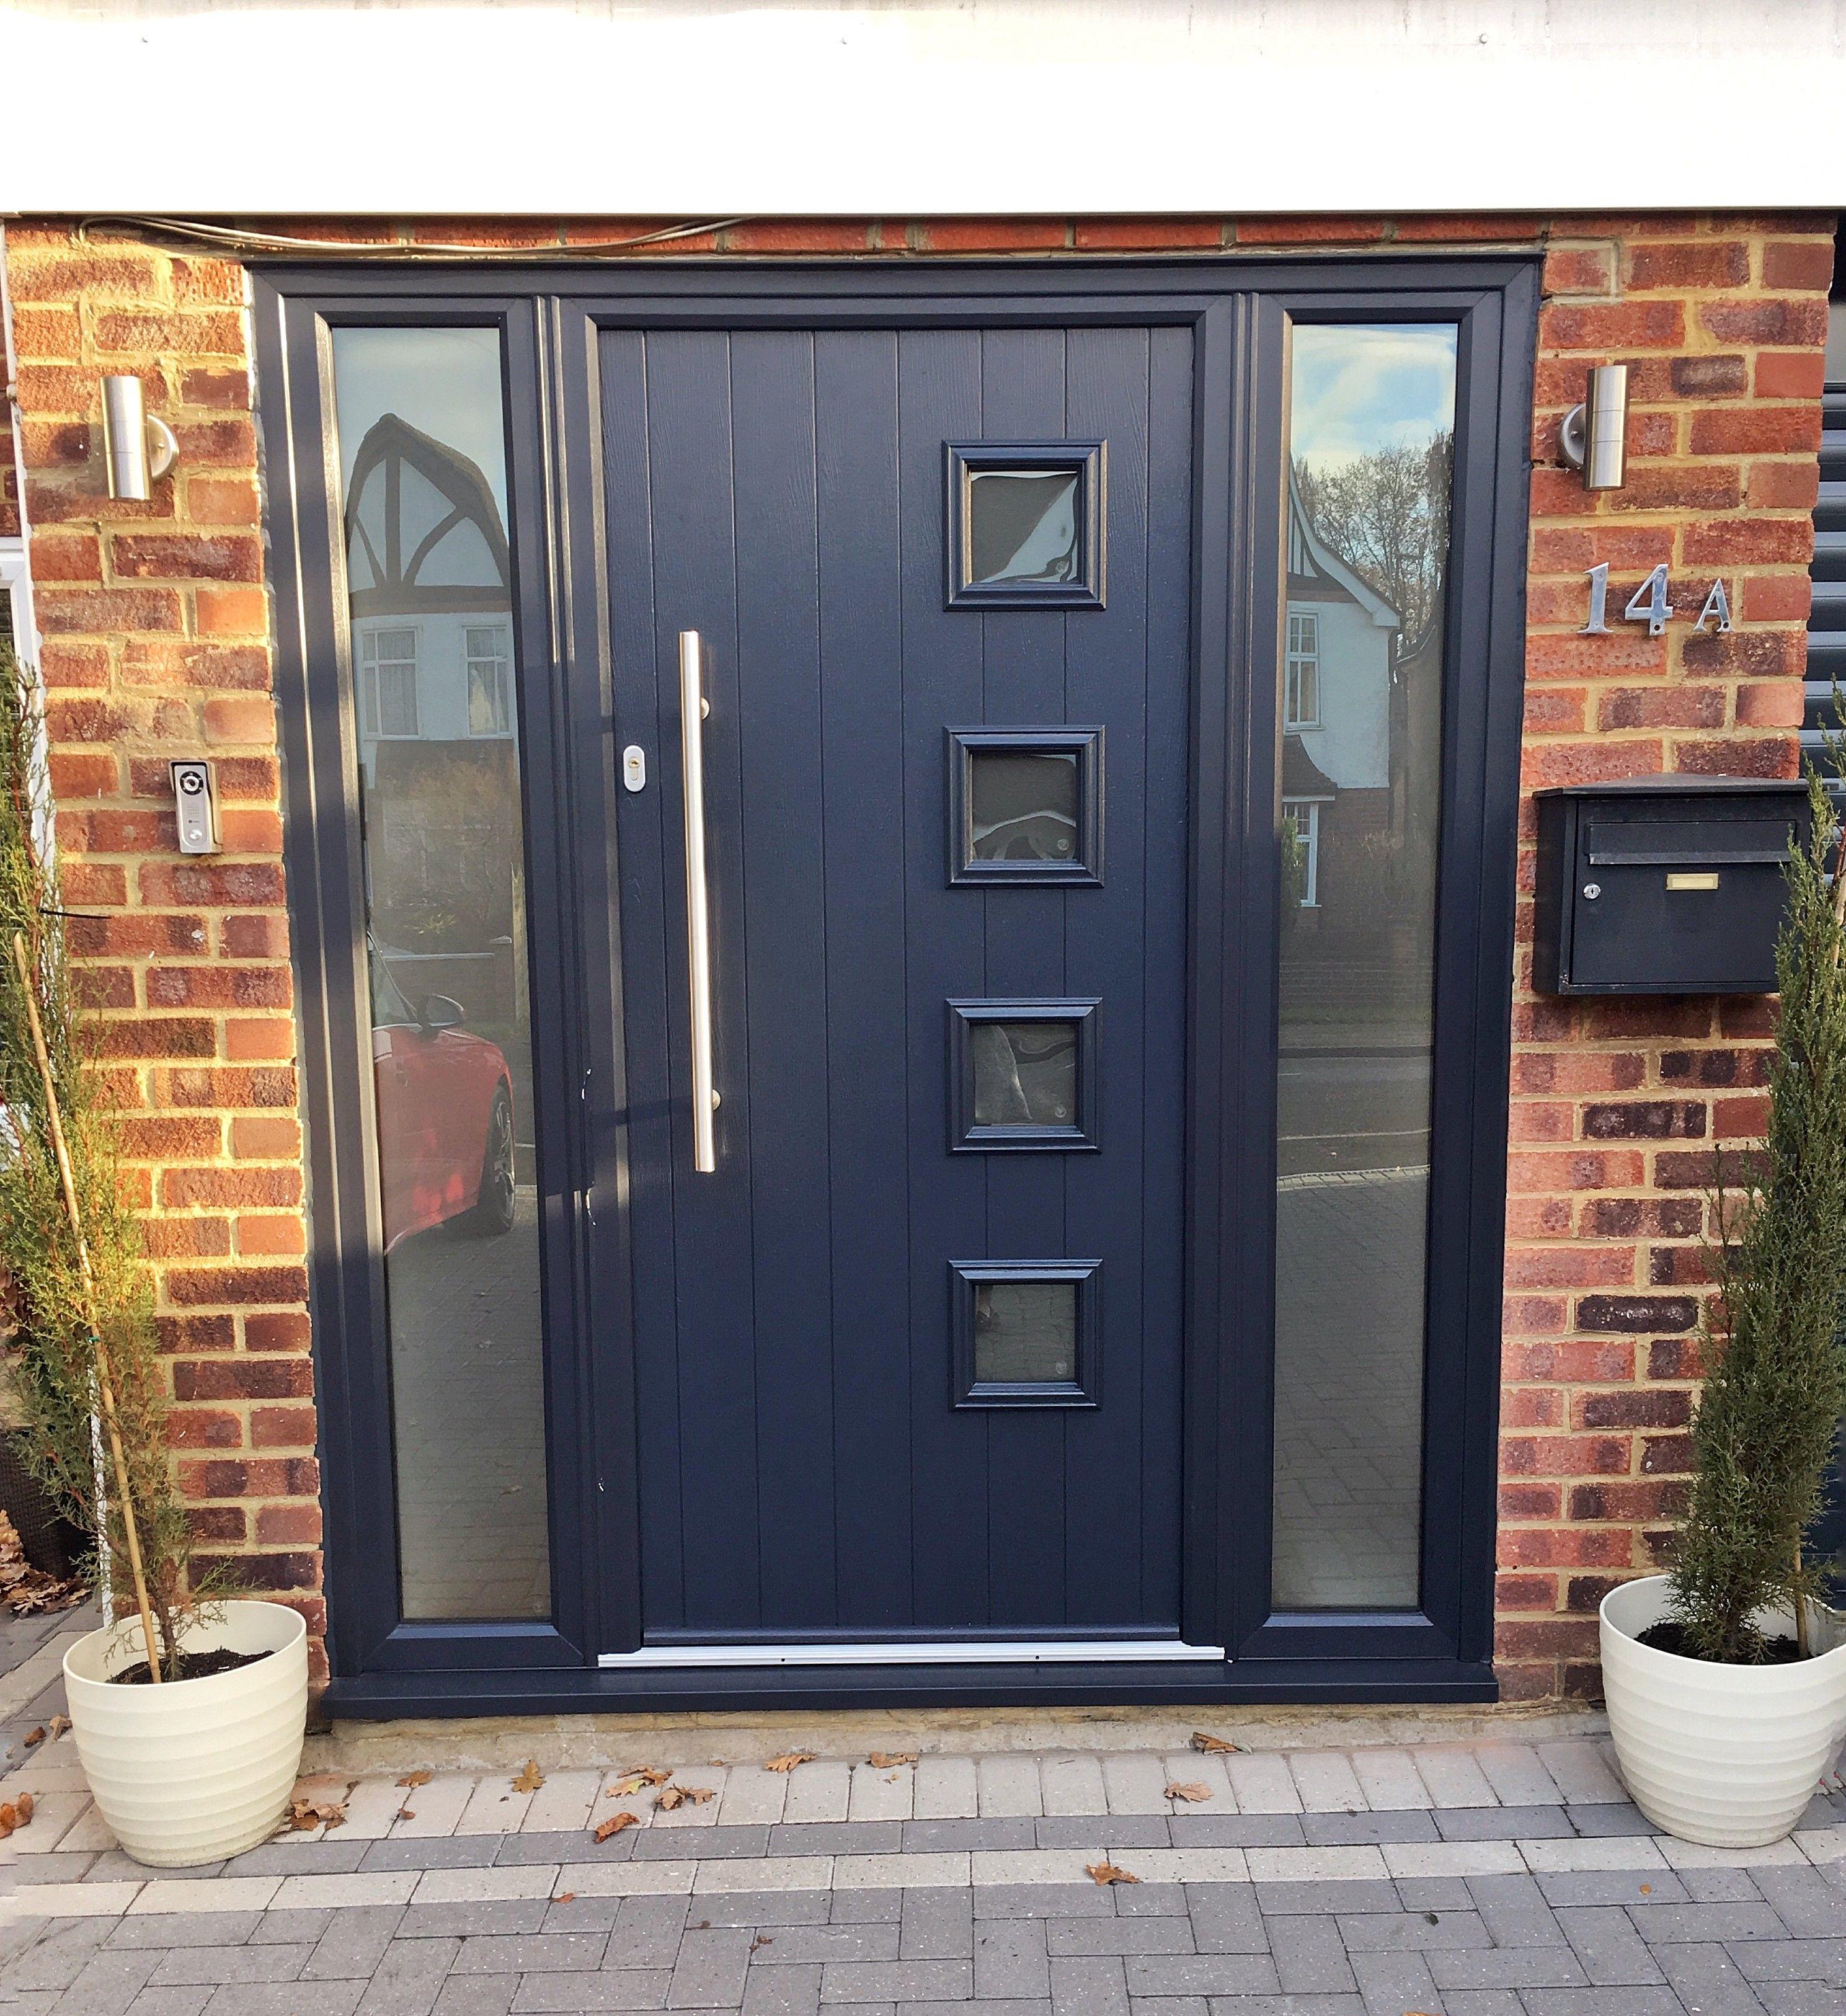 Solidor Composite Door Installed By Us In Mytchett Finished In Anthracite Grey With Side Lights Contemporary Front Doors Front Door Design Front Door Styles